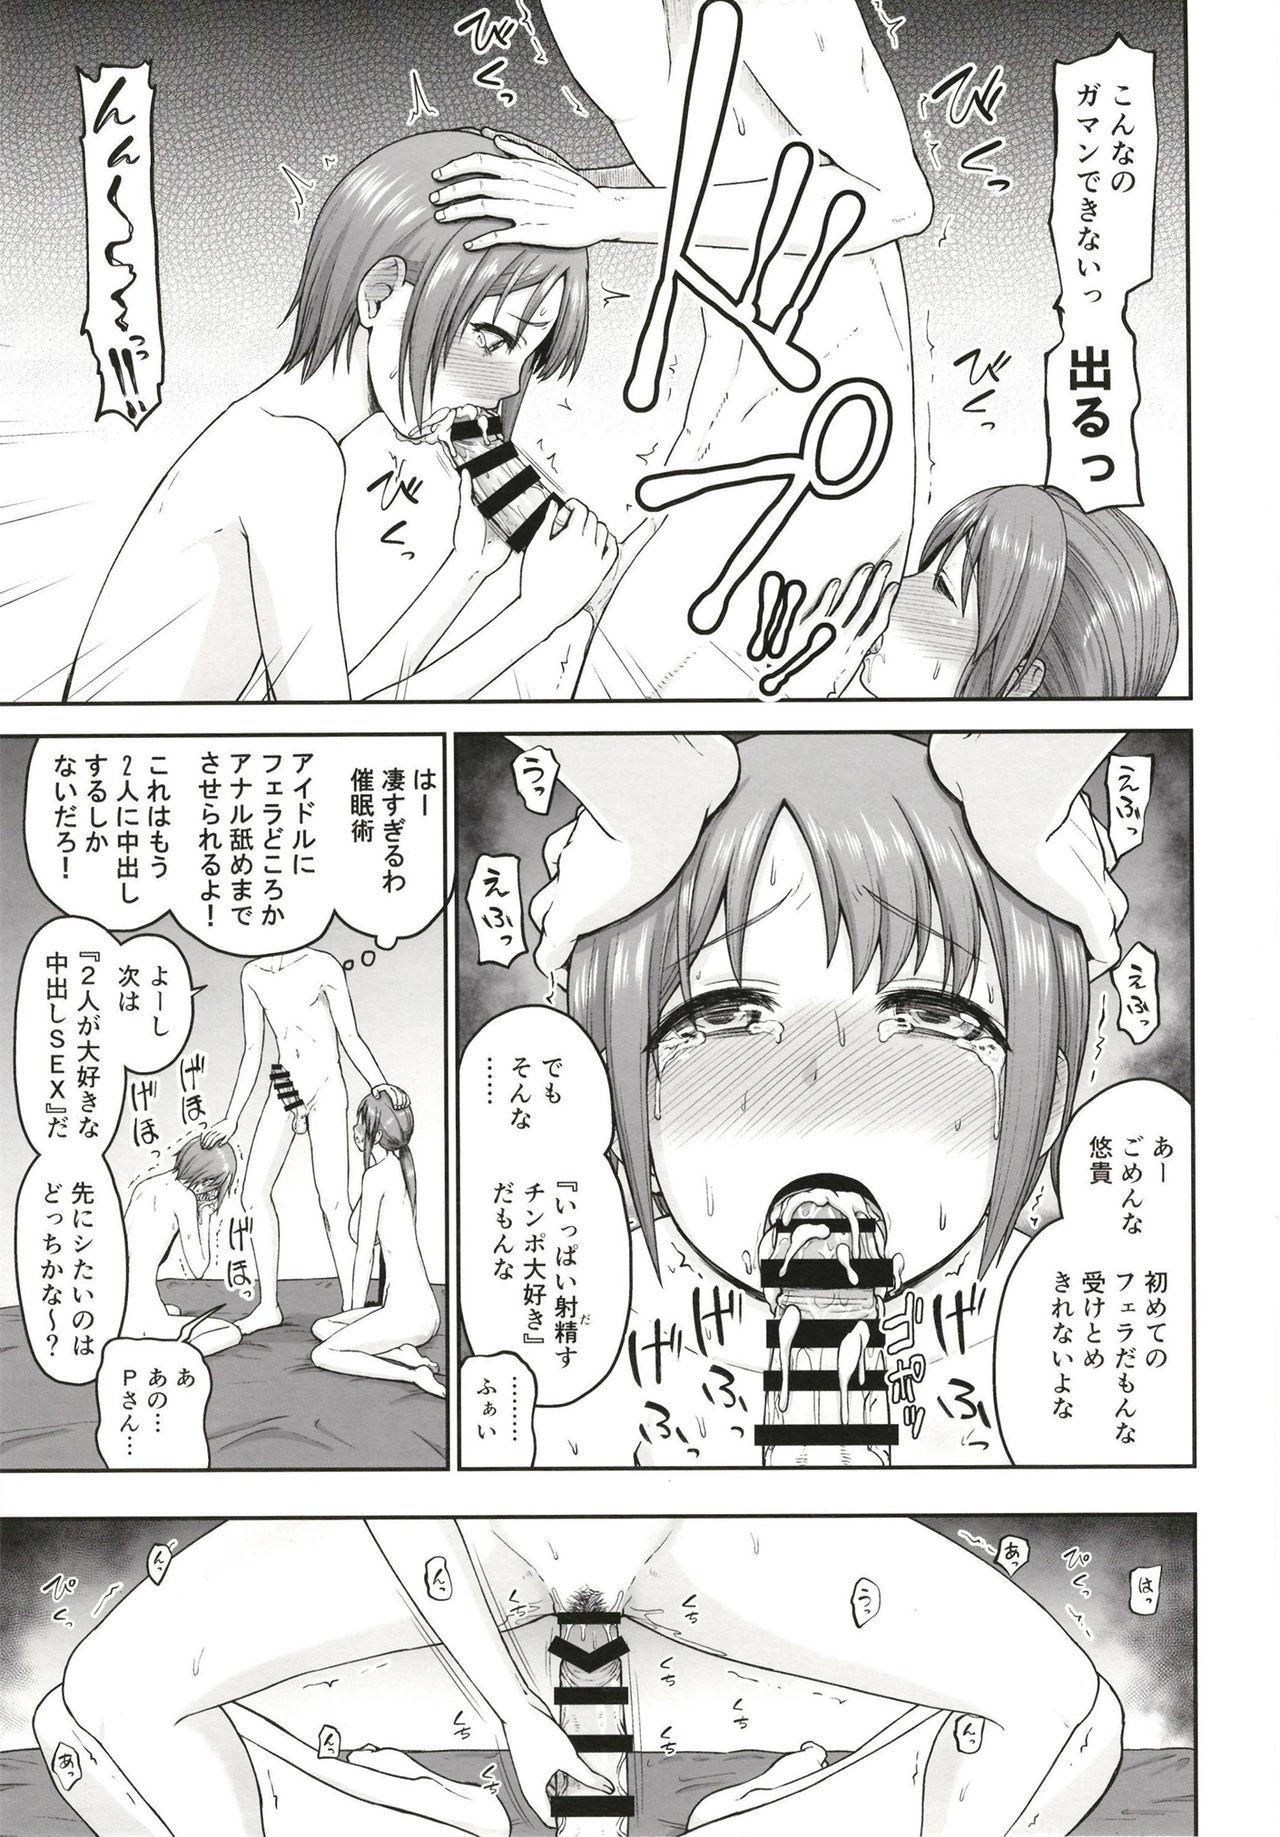 [Koppun (Hone)] Mifune-san to Otokura-chan to Saimin Sex (THE IDOLM@STER CINDERELLA GIRLS) [Digital] 14